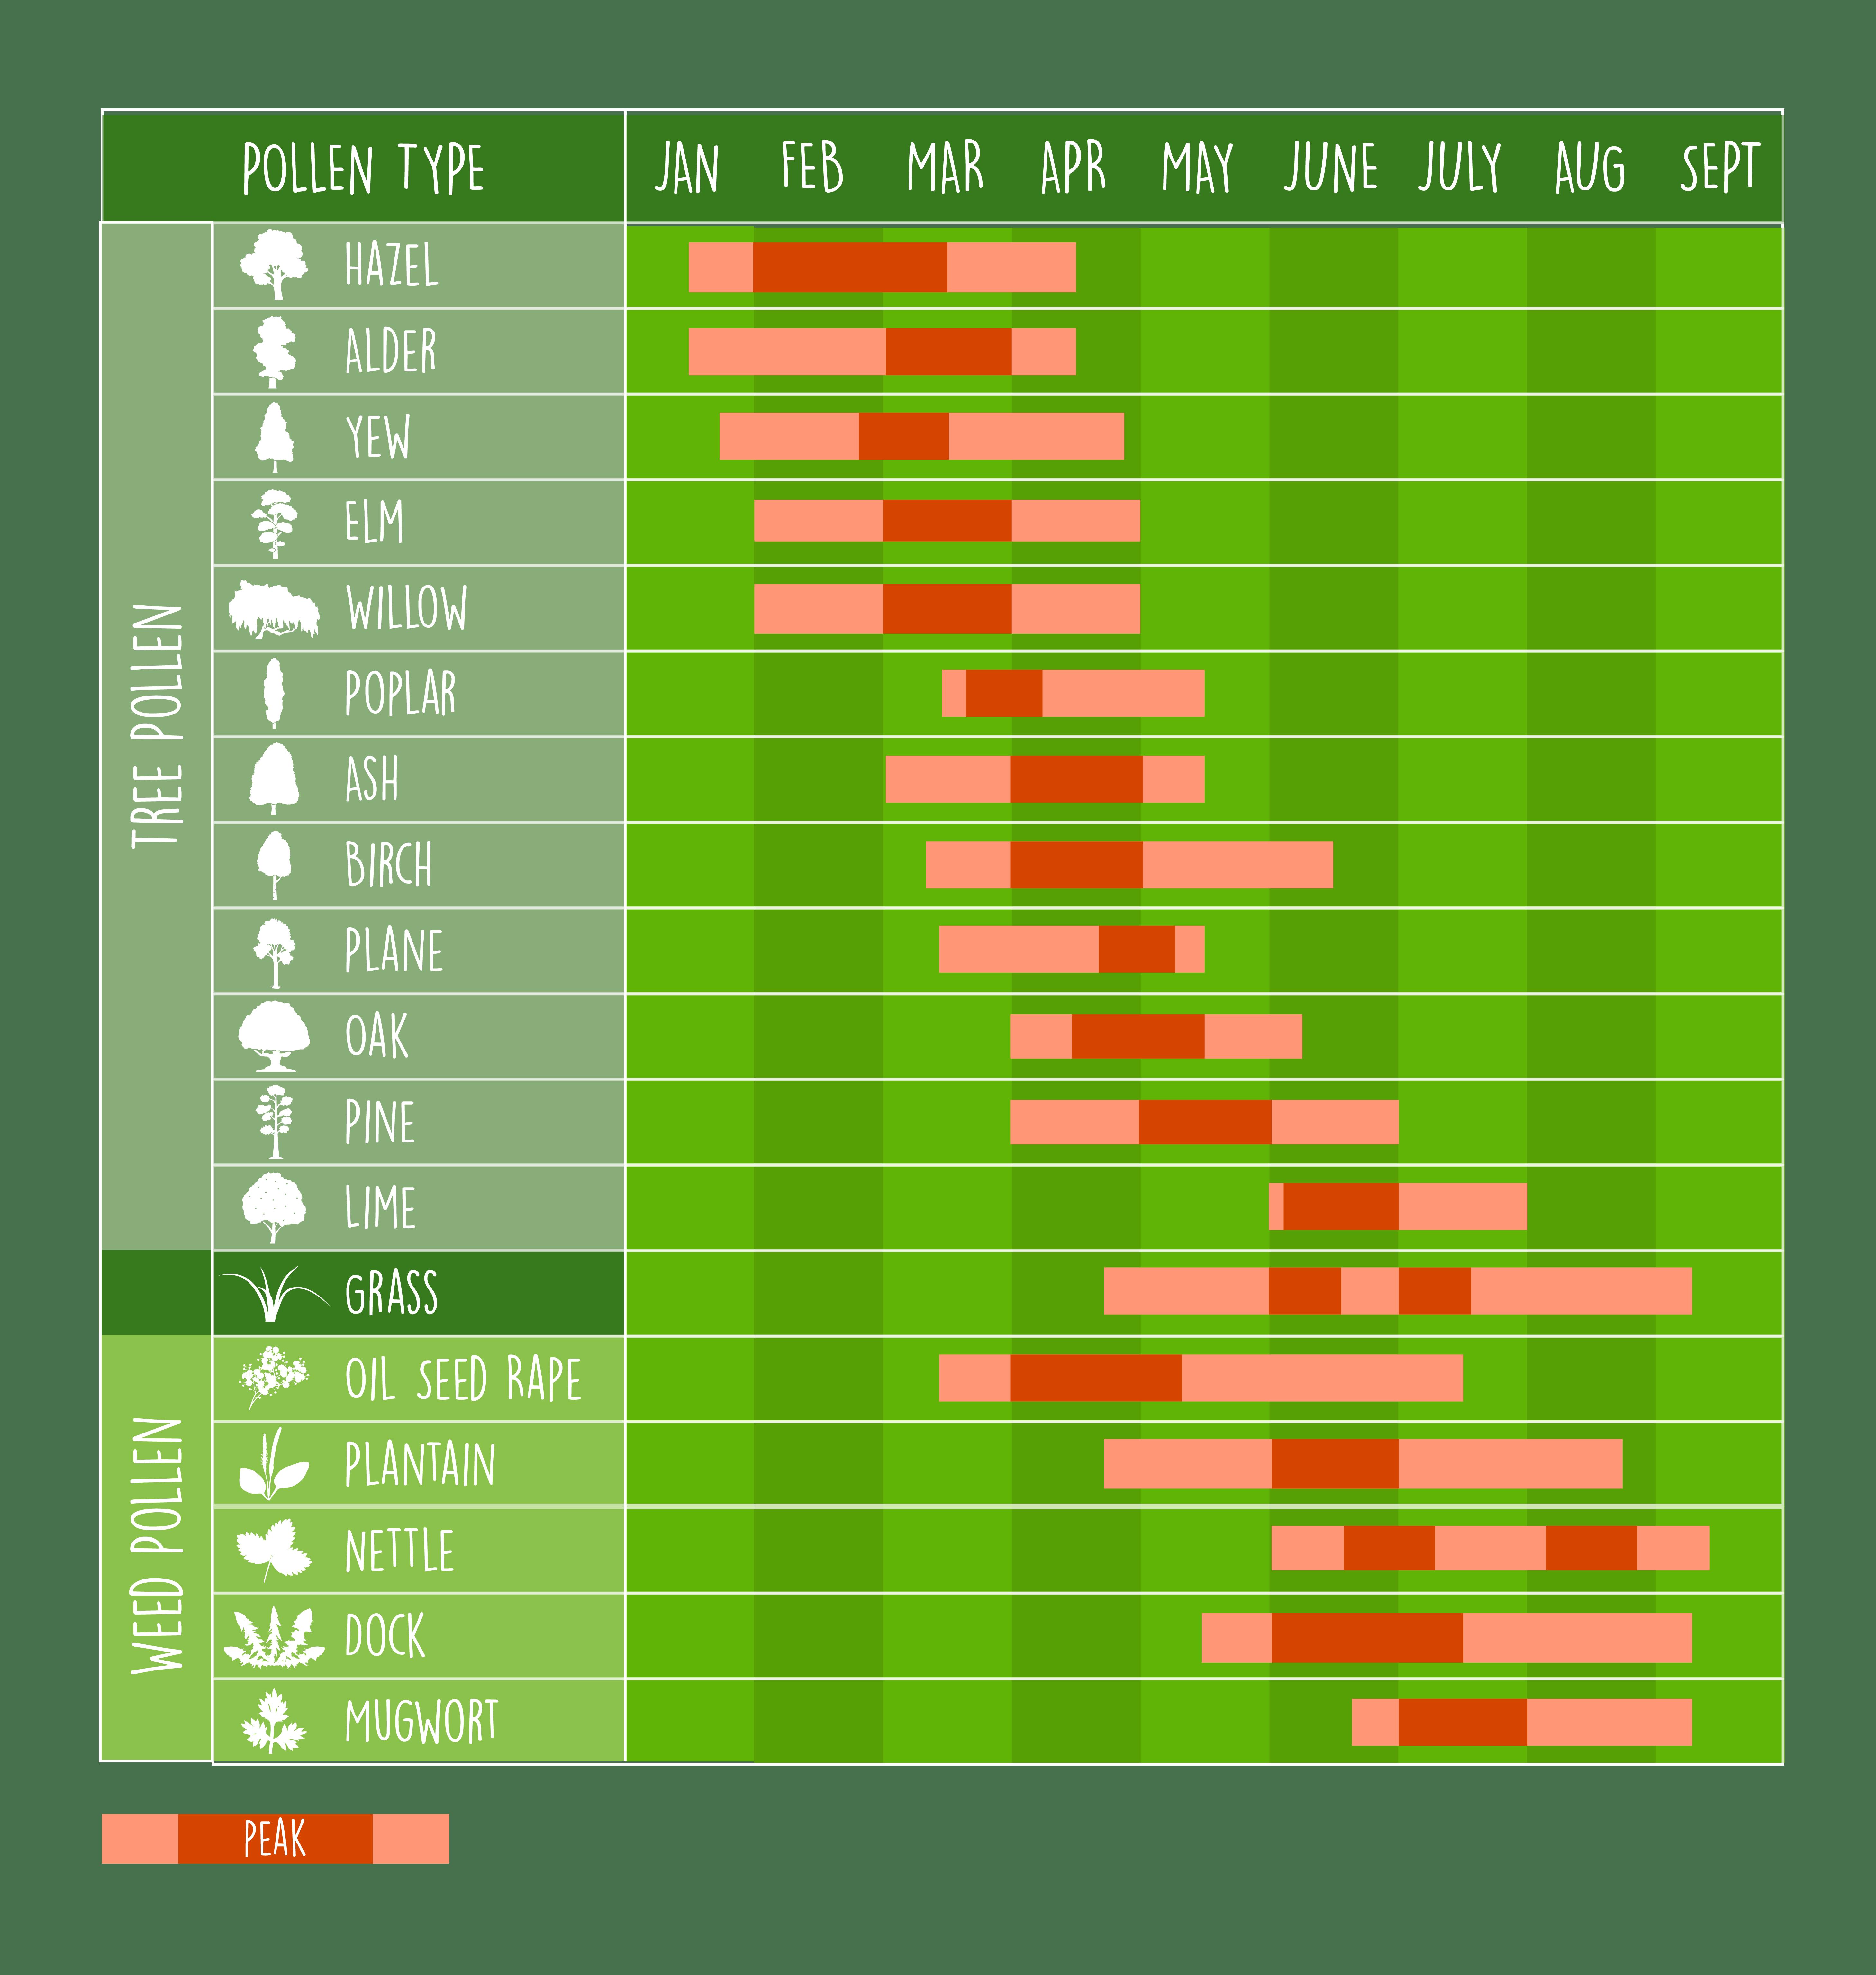 UK pollen calendar illustration, showing pollen seasons through the year